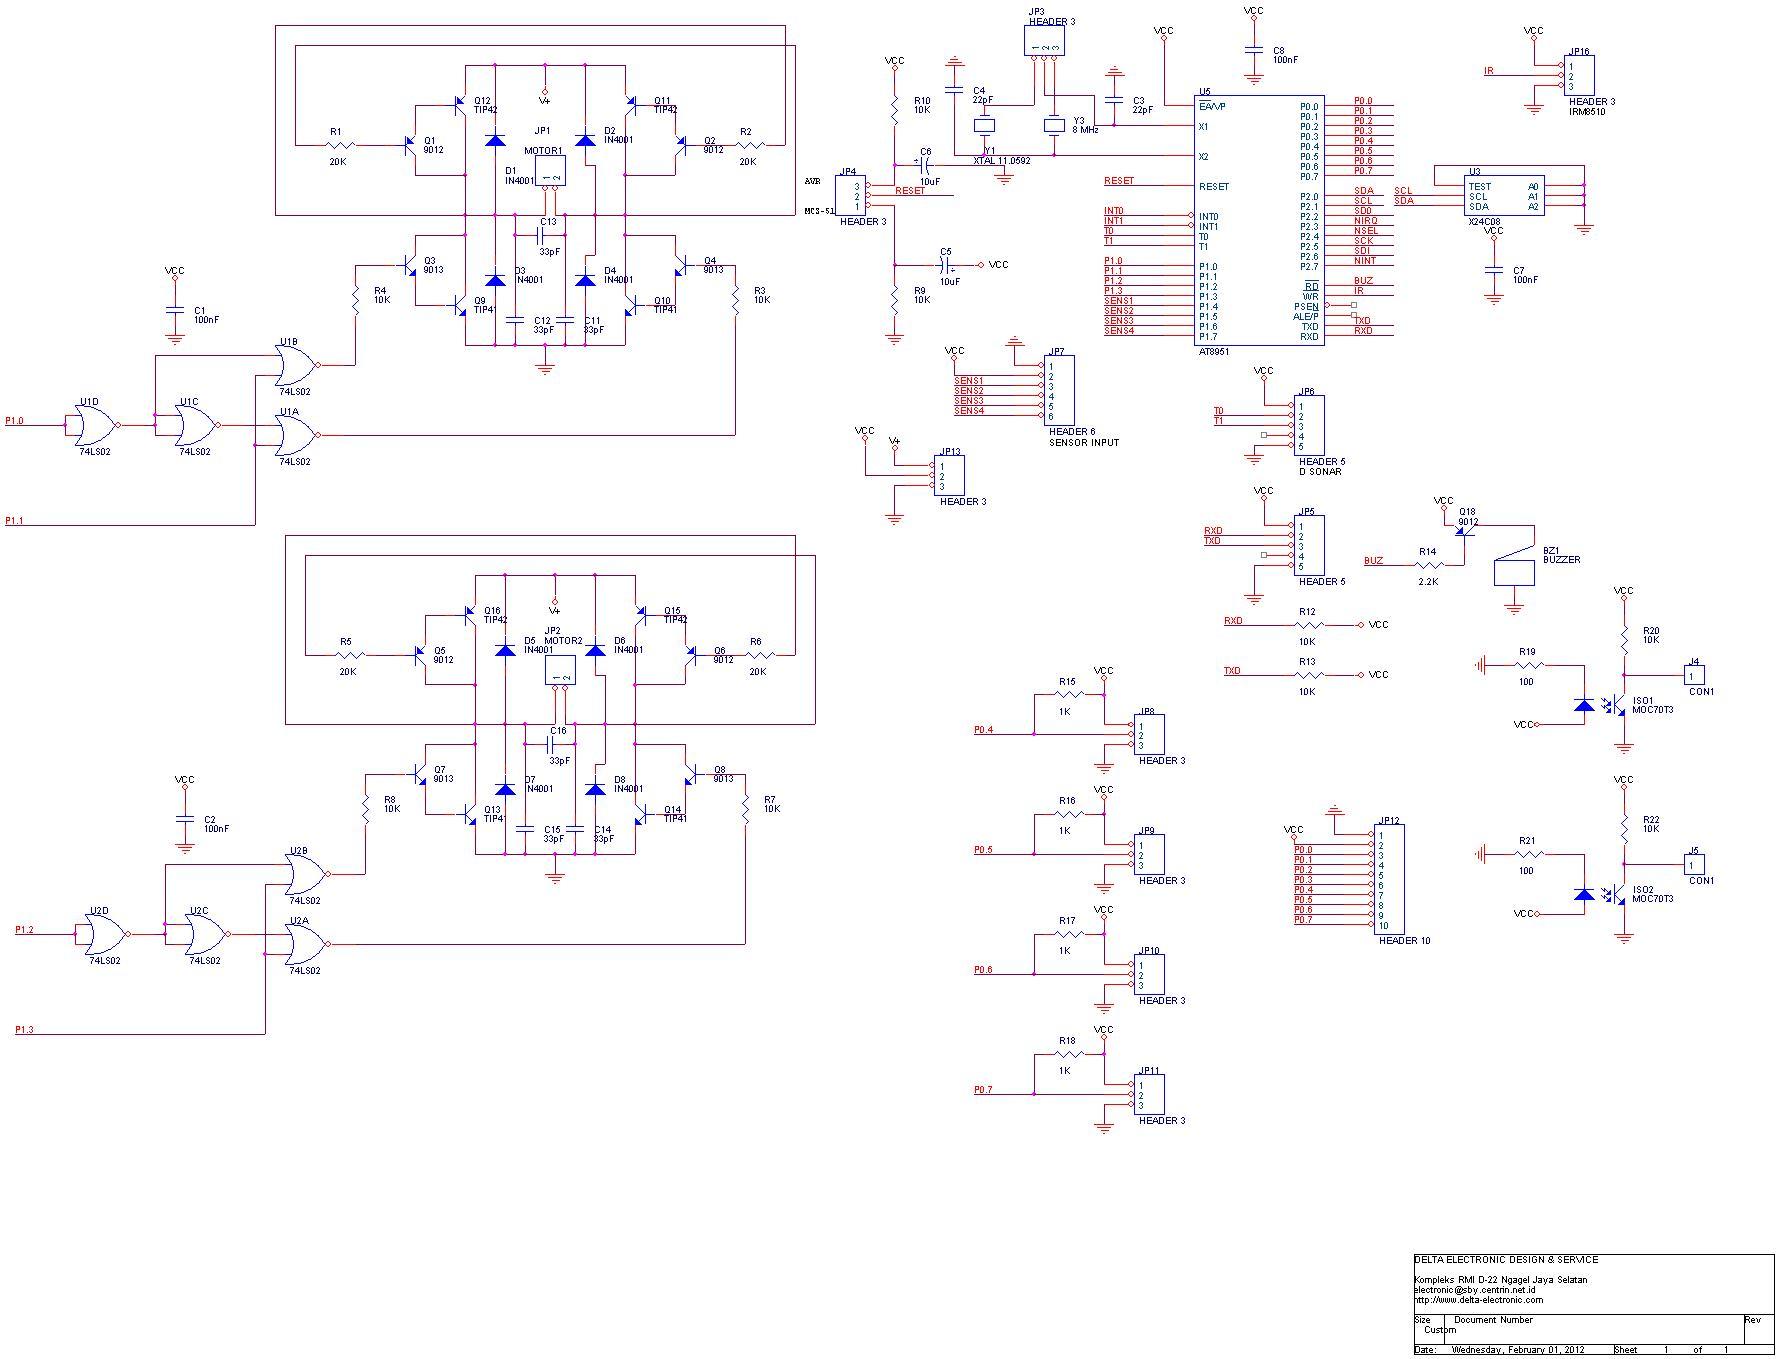 An0181 membangun rangkaian elektronik robot beroda delta skema mikrokontroler dan driver motor robot ccuart Image collections